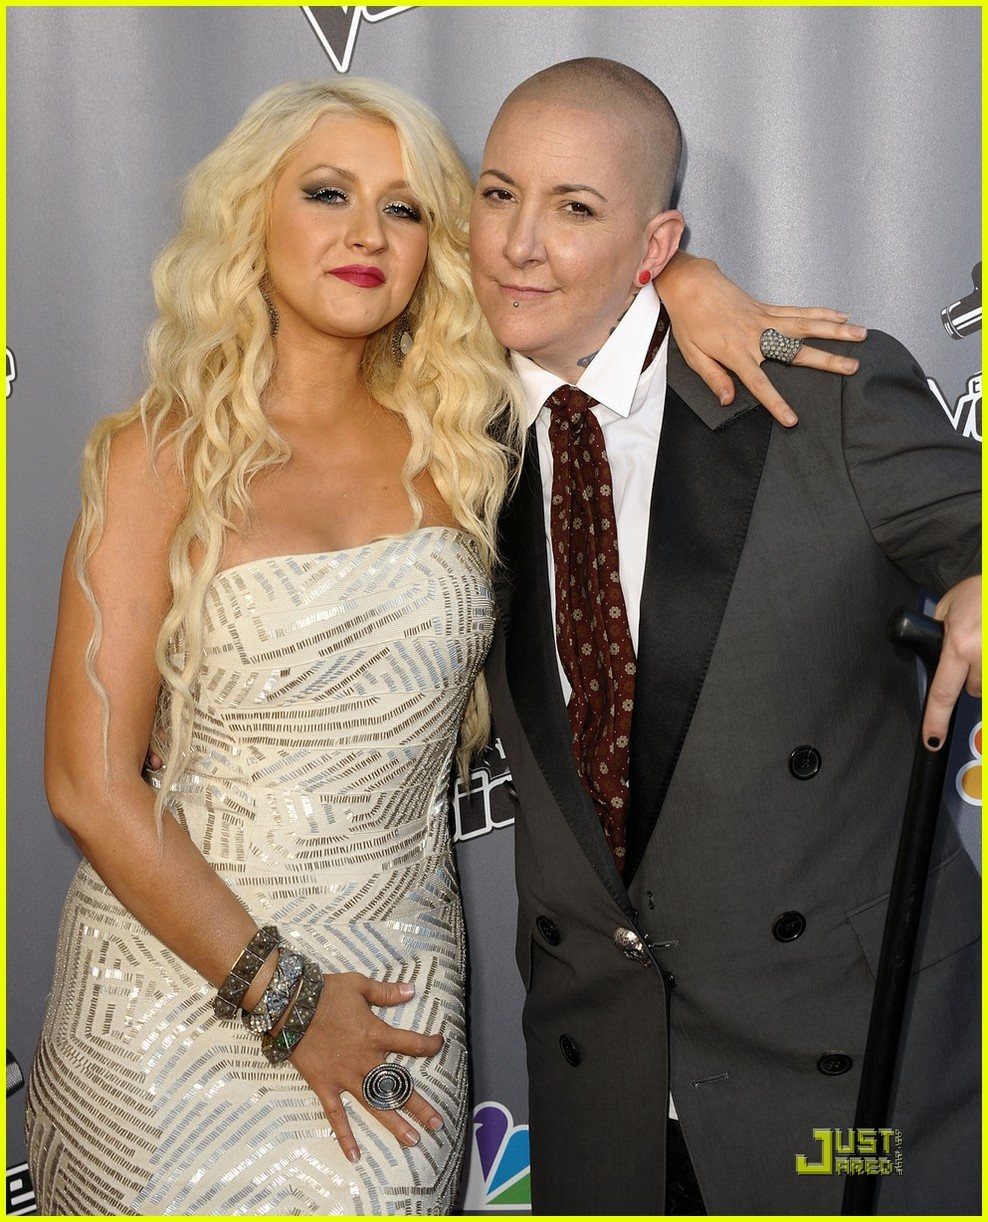 adam and christina dating 2013